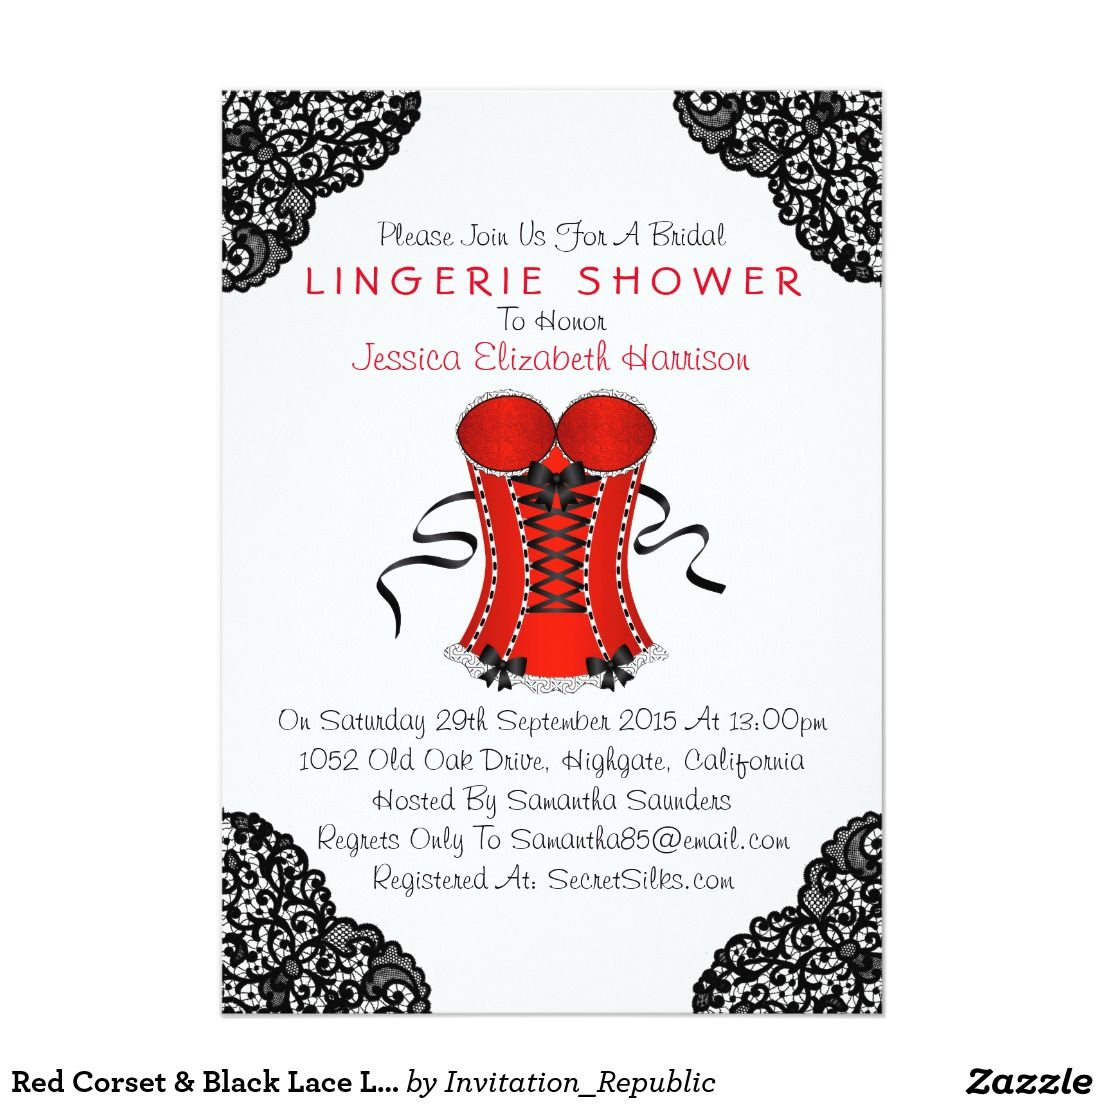 Red Corset & Black Lace Lingerie Shower Invitation | Bachelorette ...